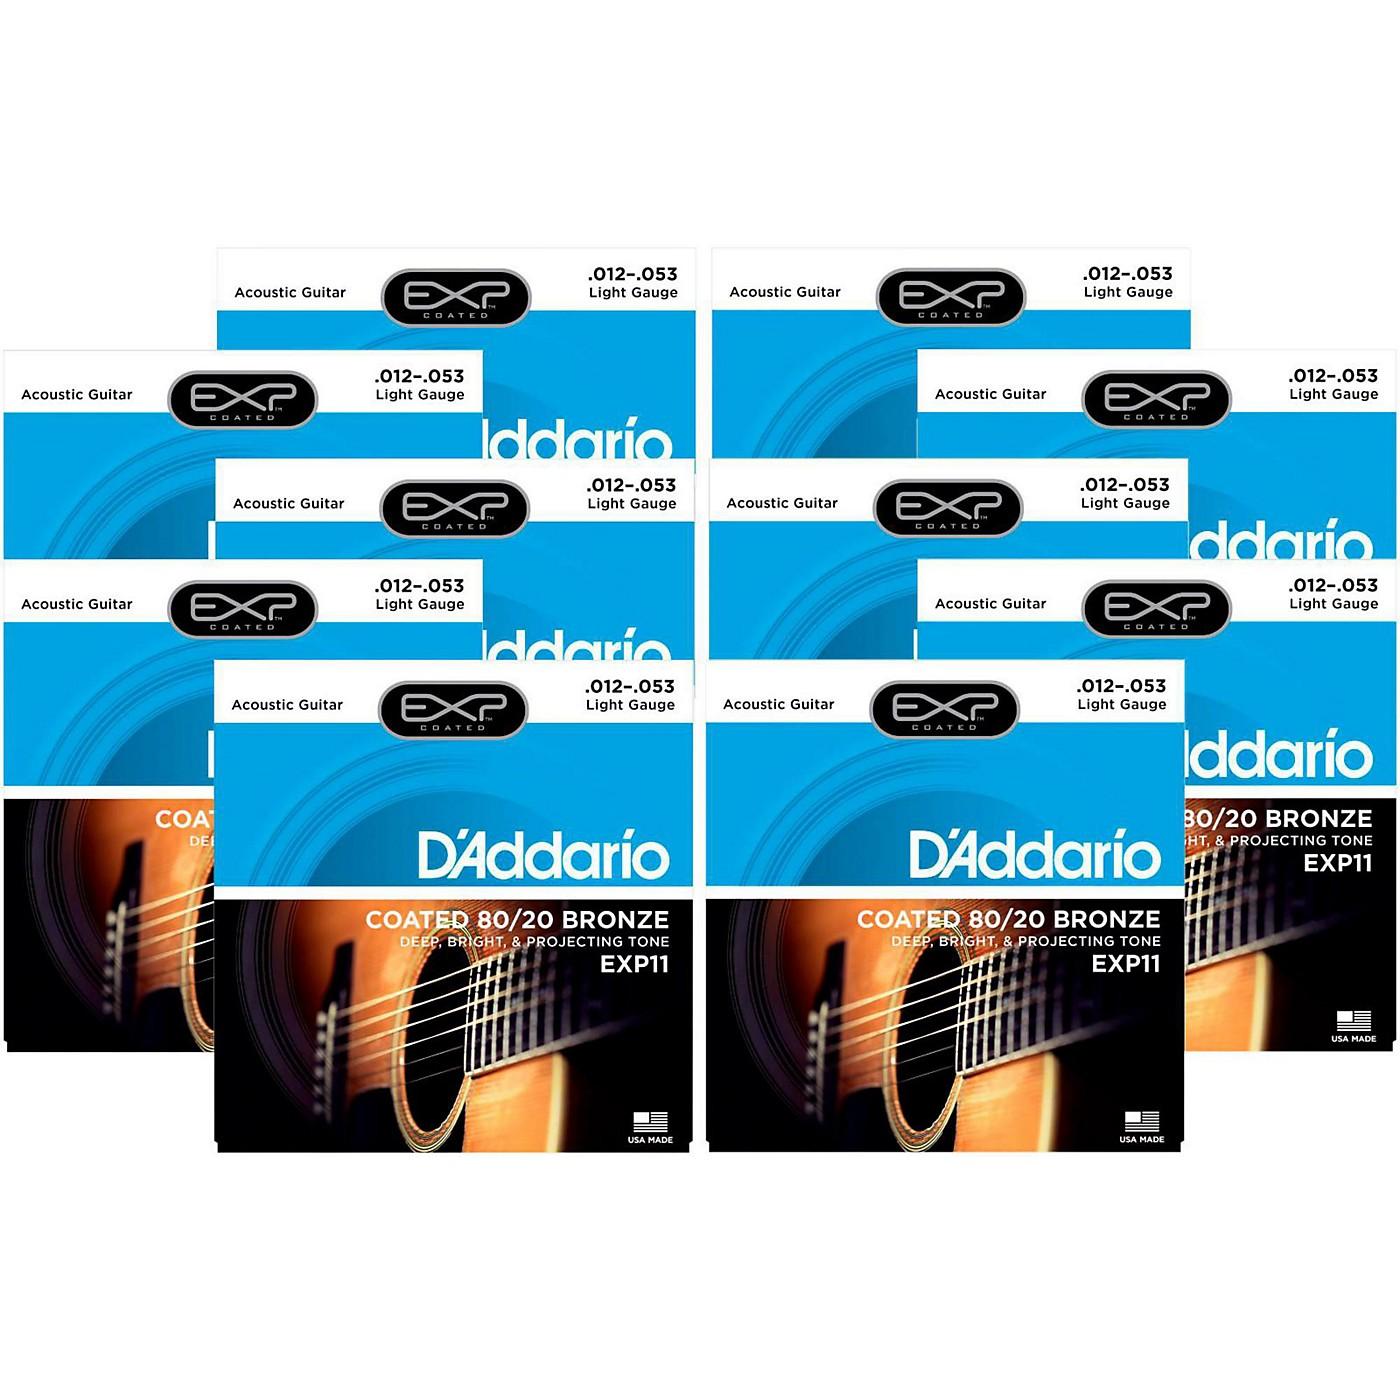 D'Addario EXP11 Coated 80/20 Bronze Light Acoustic Guitar Strings - 10 Pack thumbnail